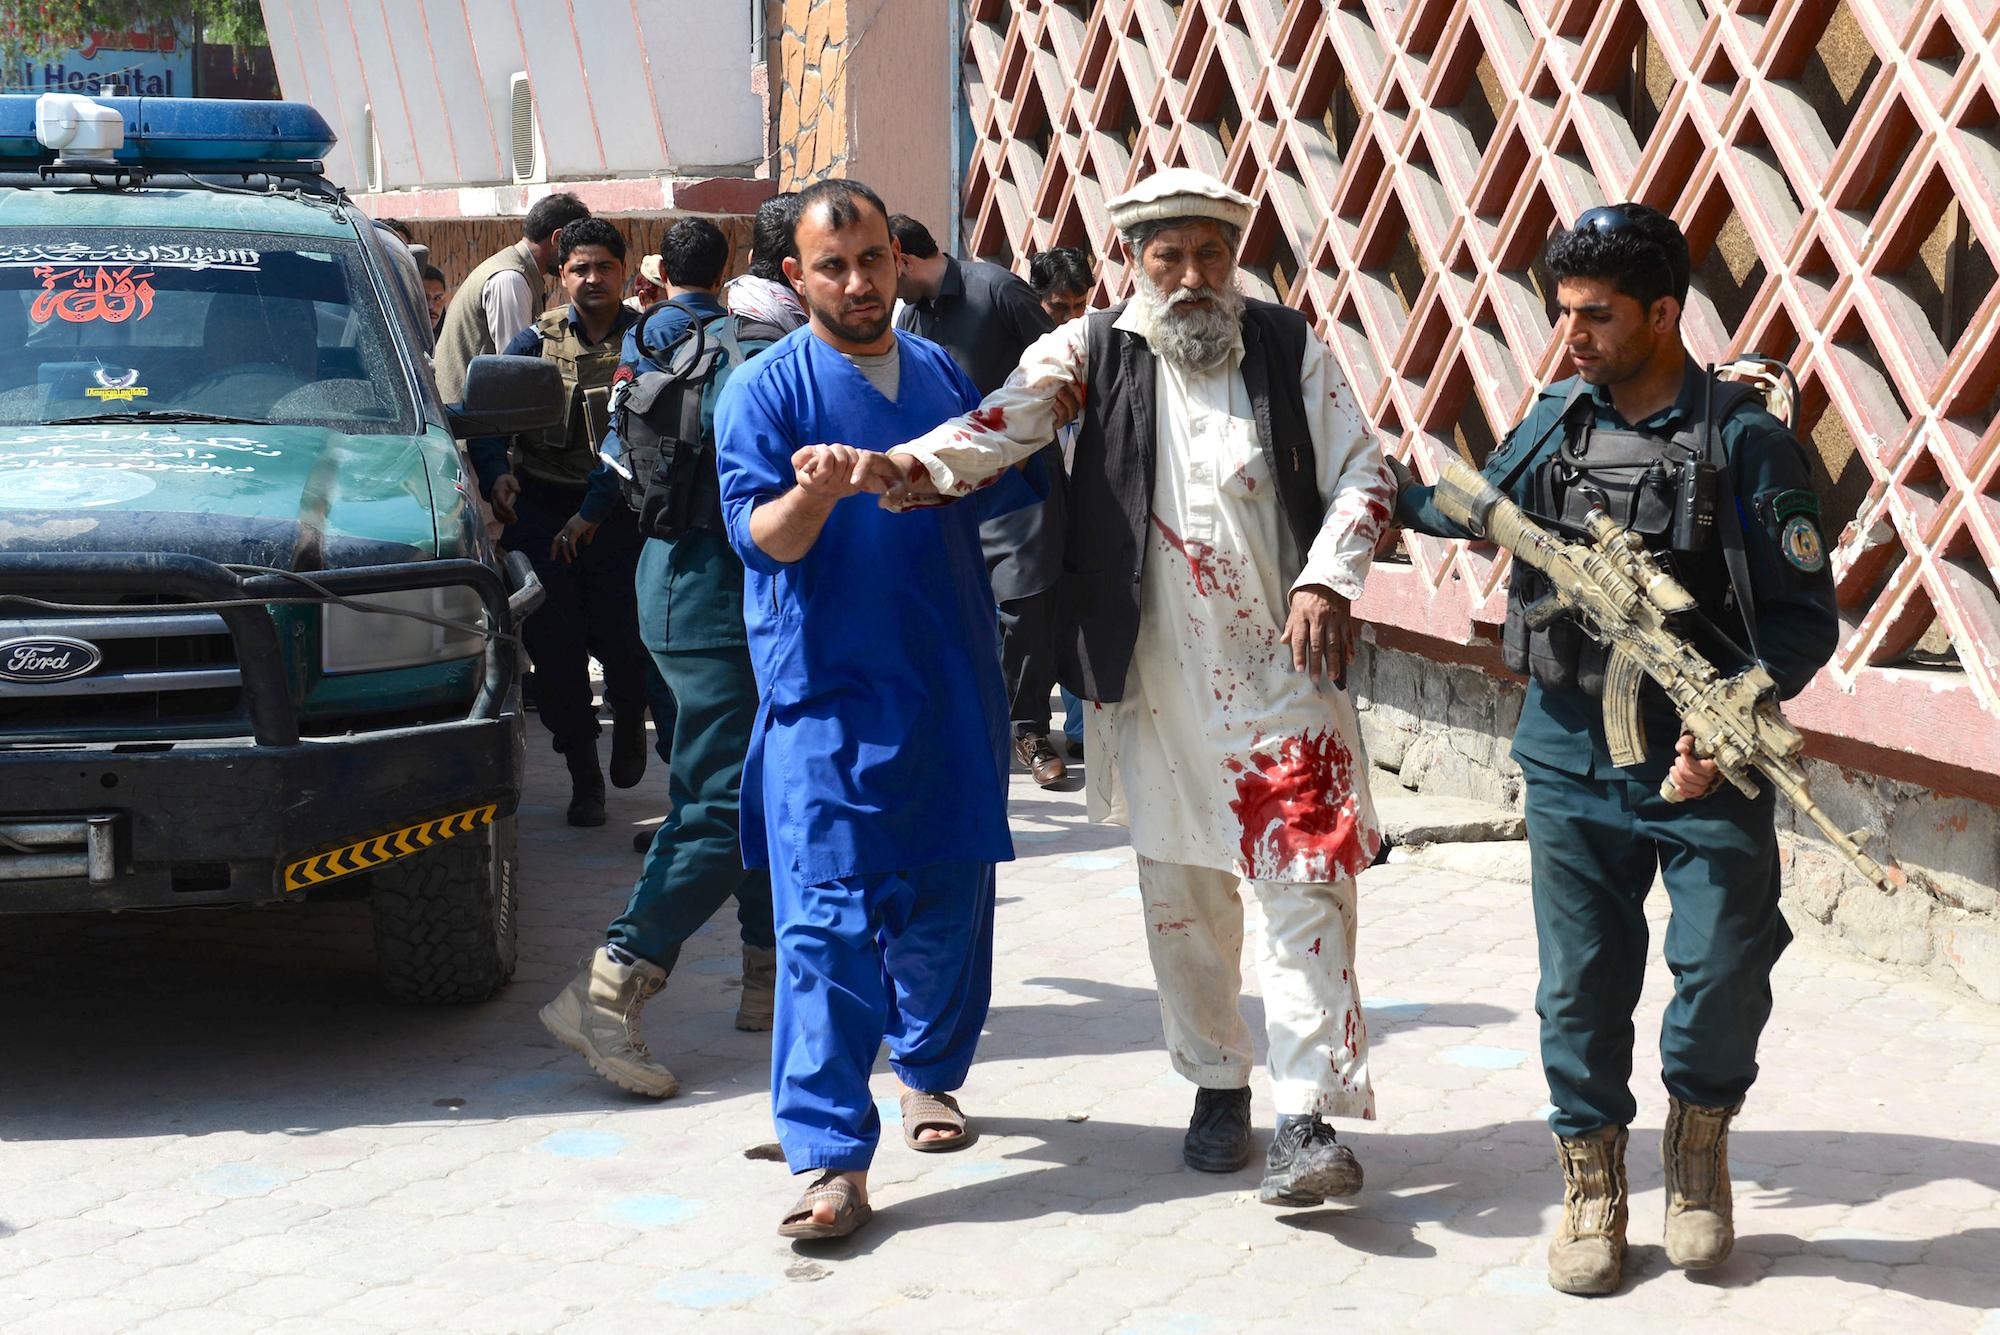 Motorcycle bombs kill 5 civilians in Nangarhar, Herat